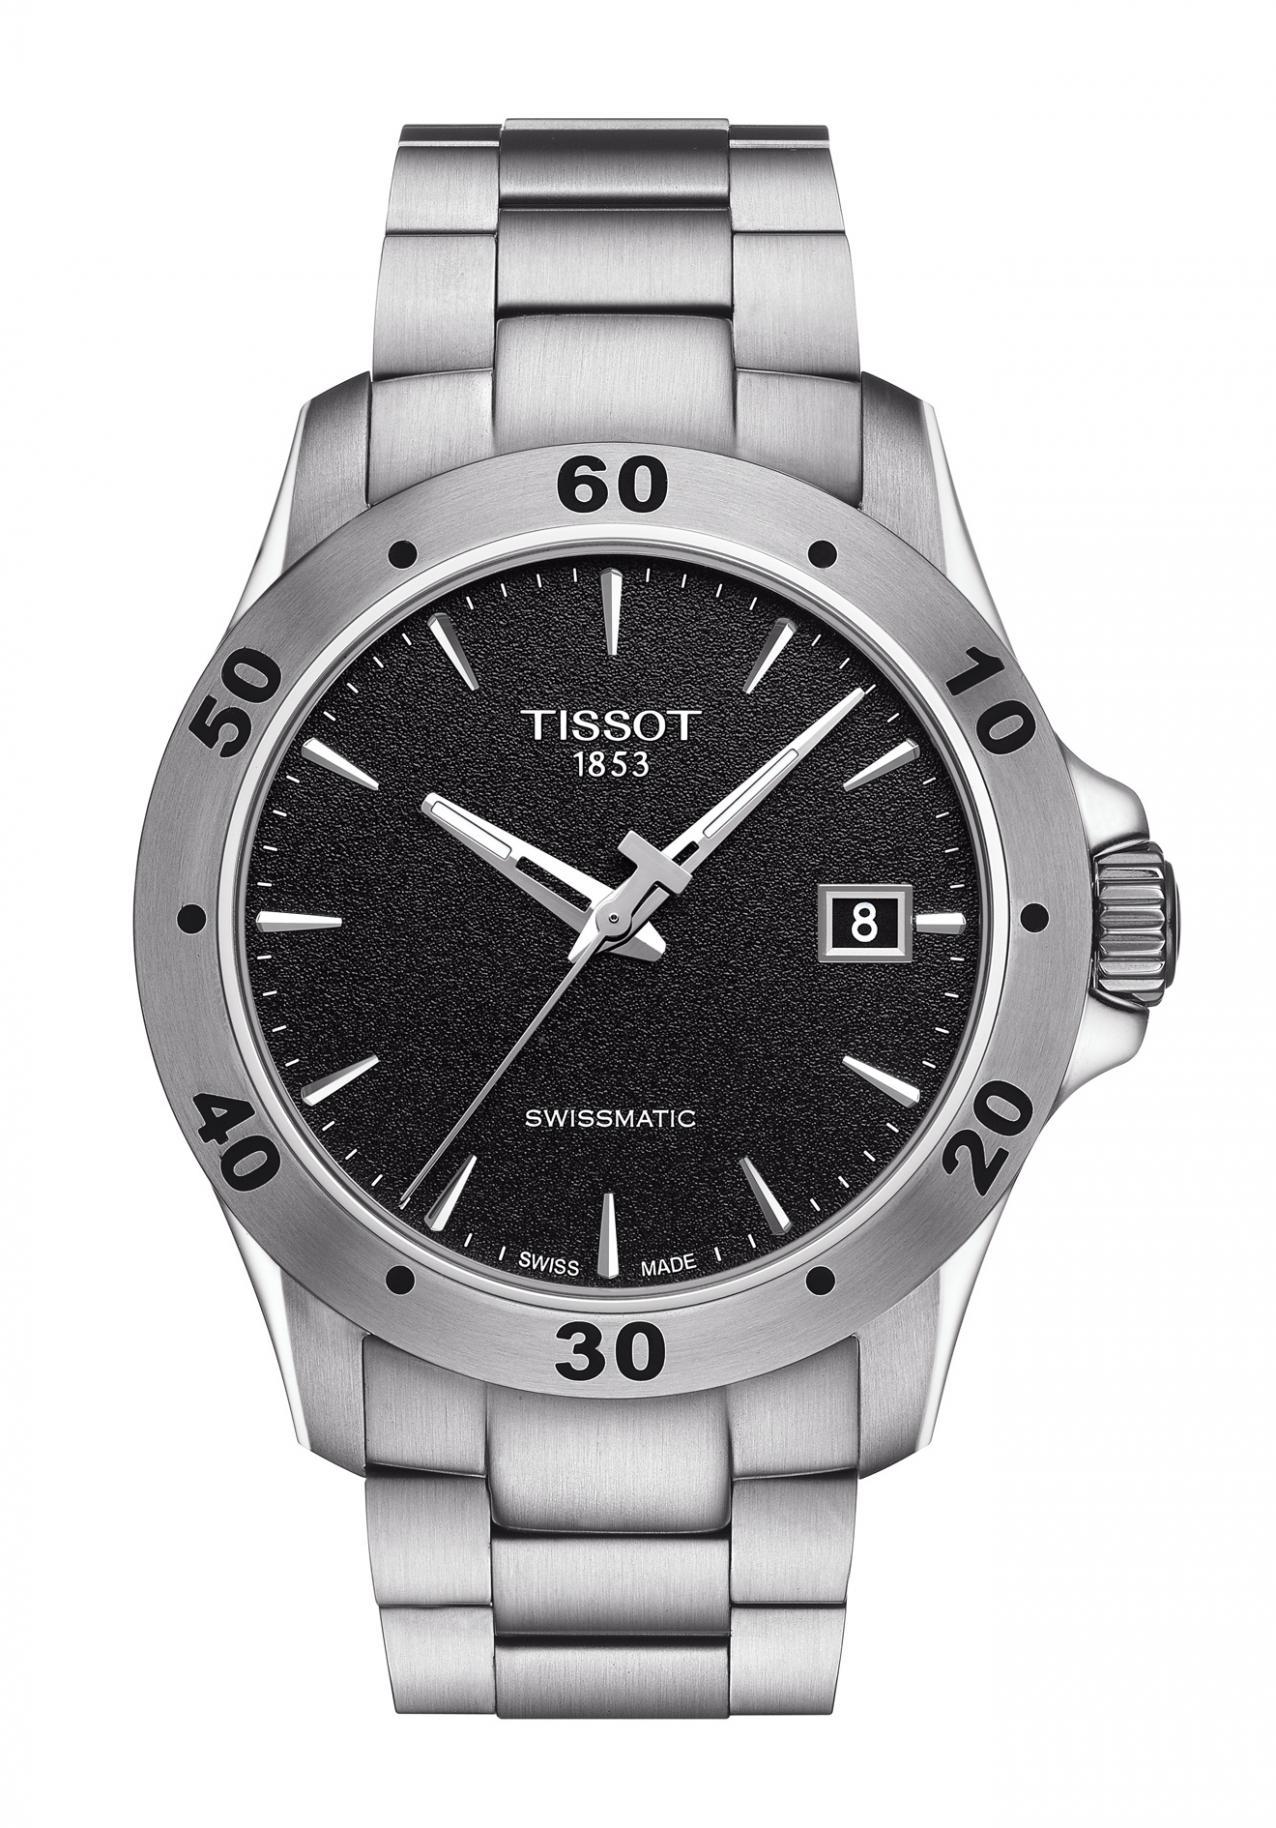 Tissot V8 Swissmatic Mens Watch Automatic Nur 44000 Prc 200 T0554301105700 Black Official Dealer